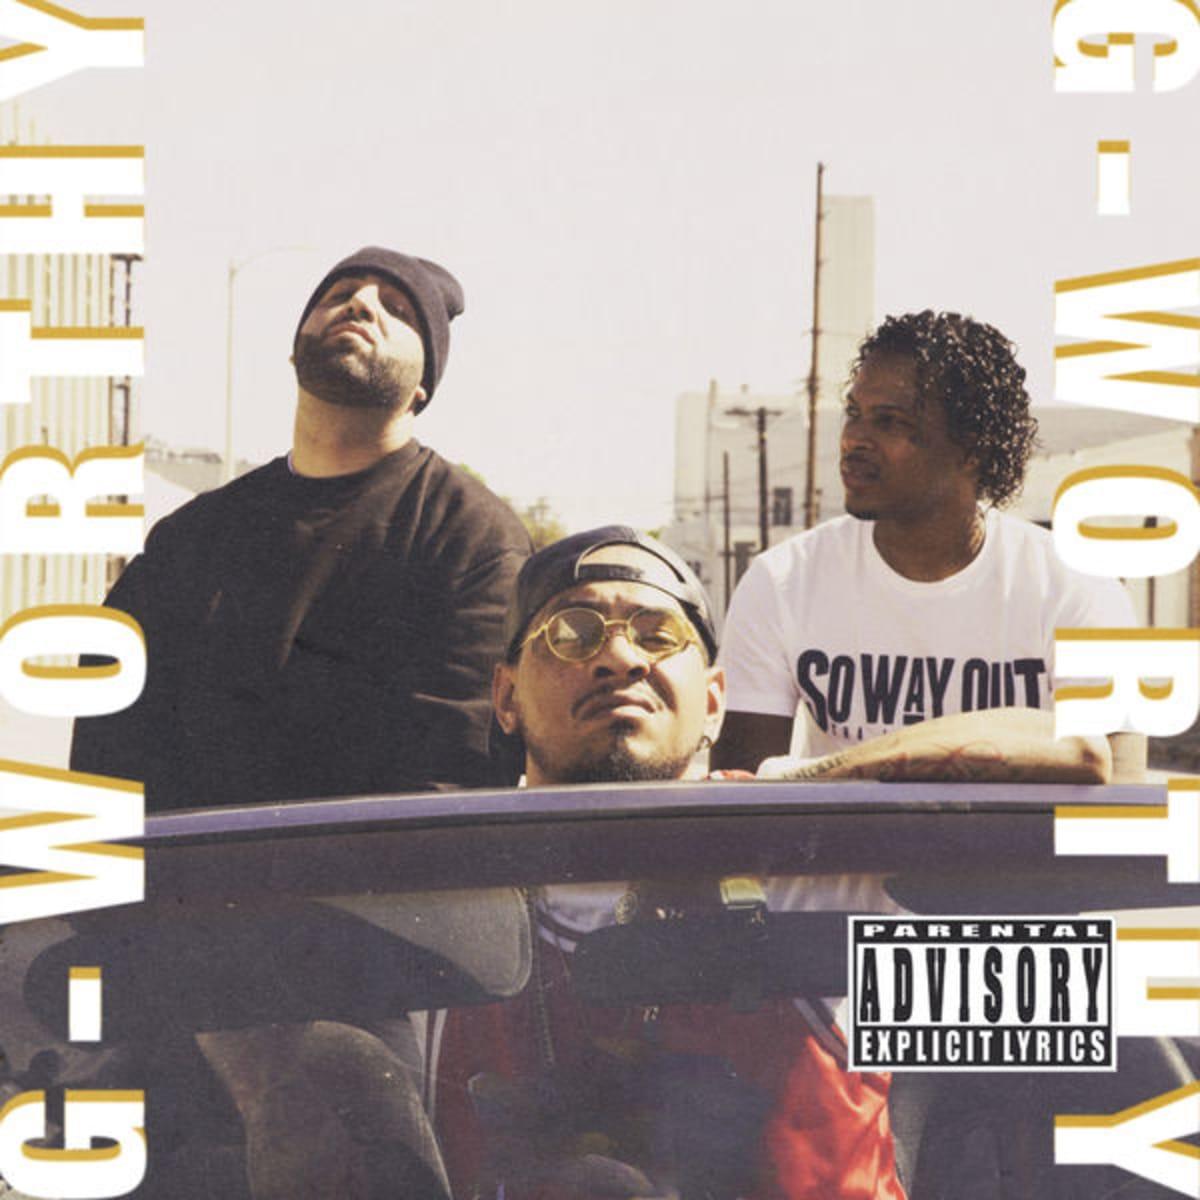 g-worthy-album-cover